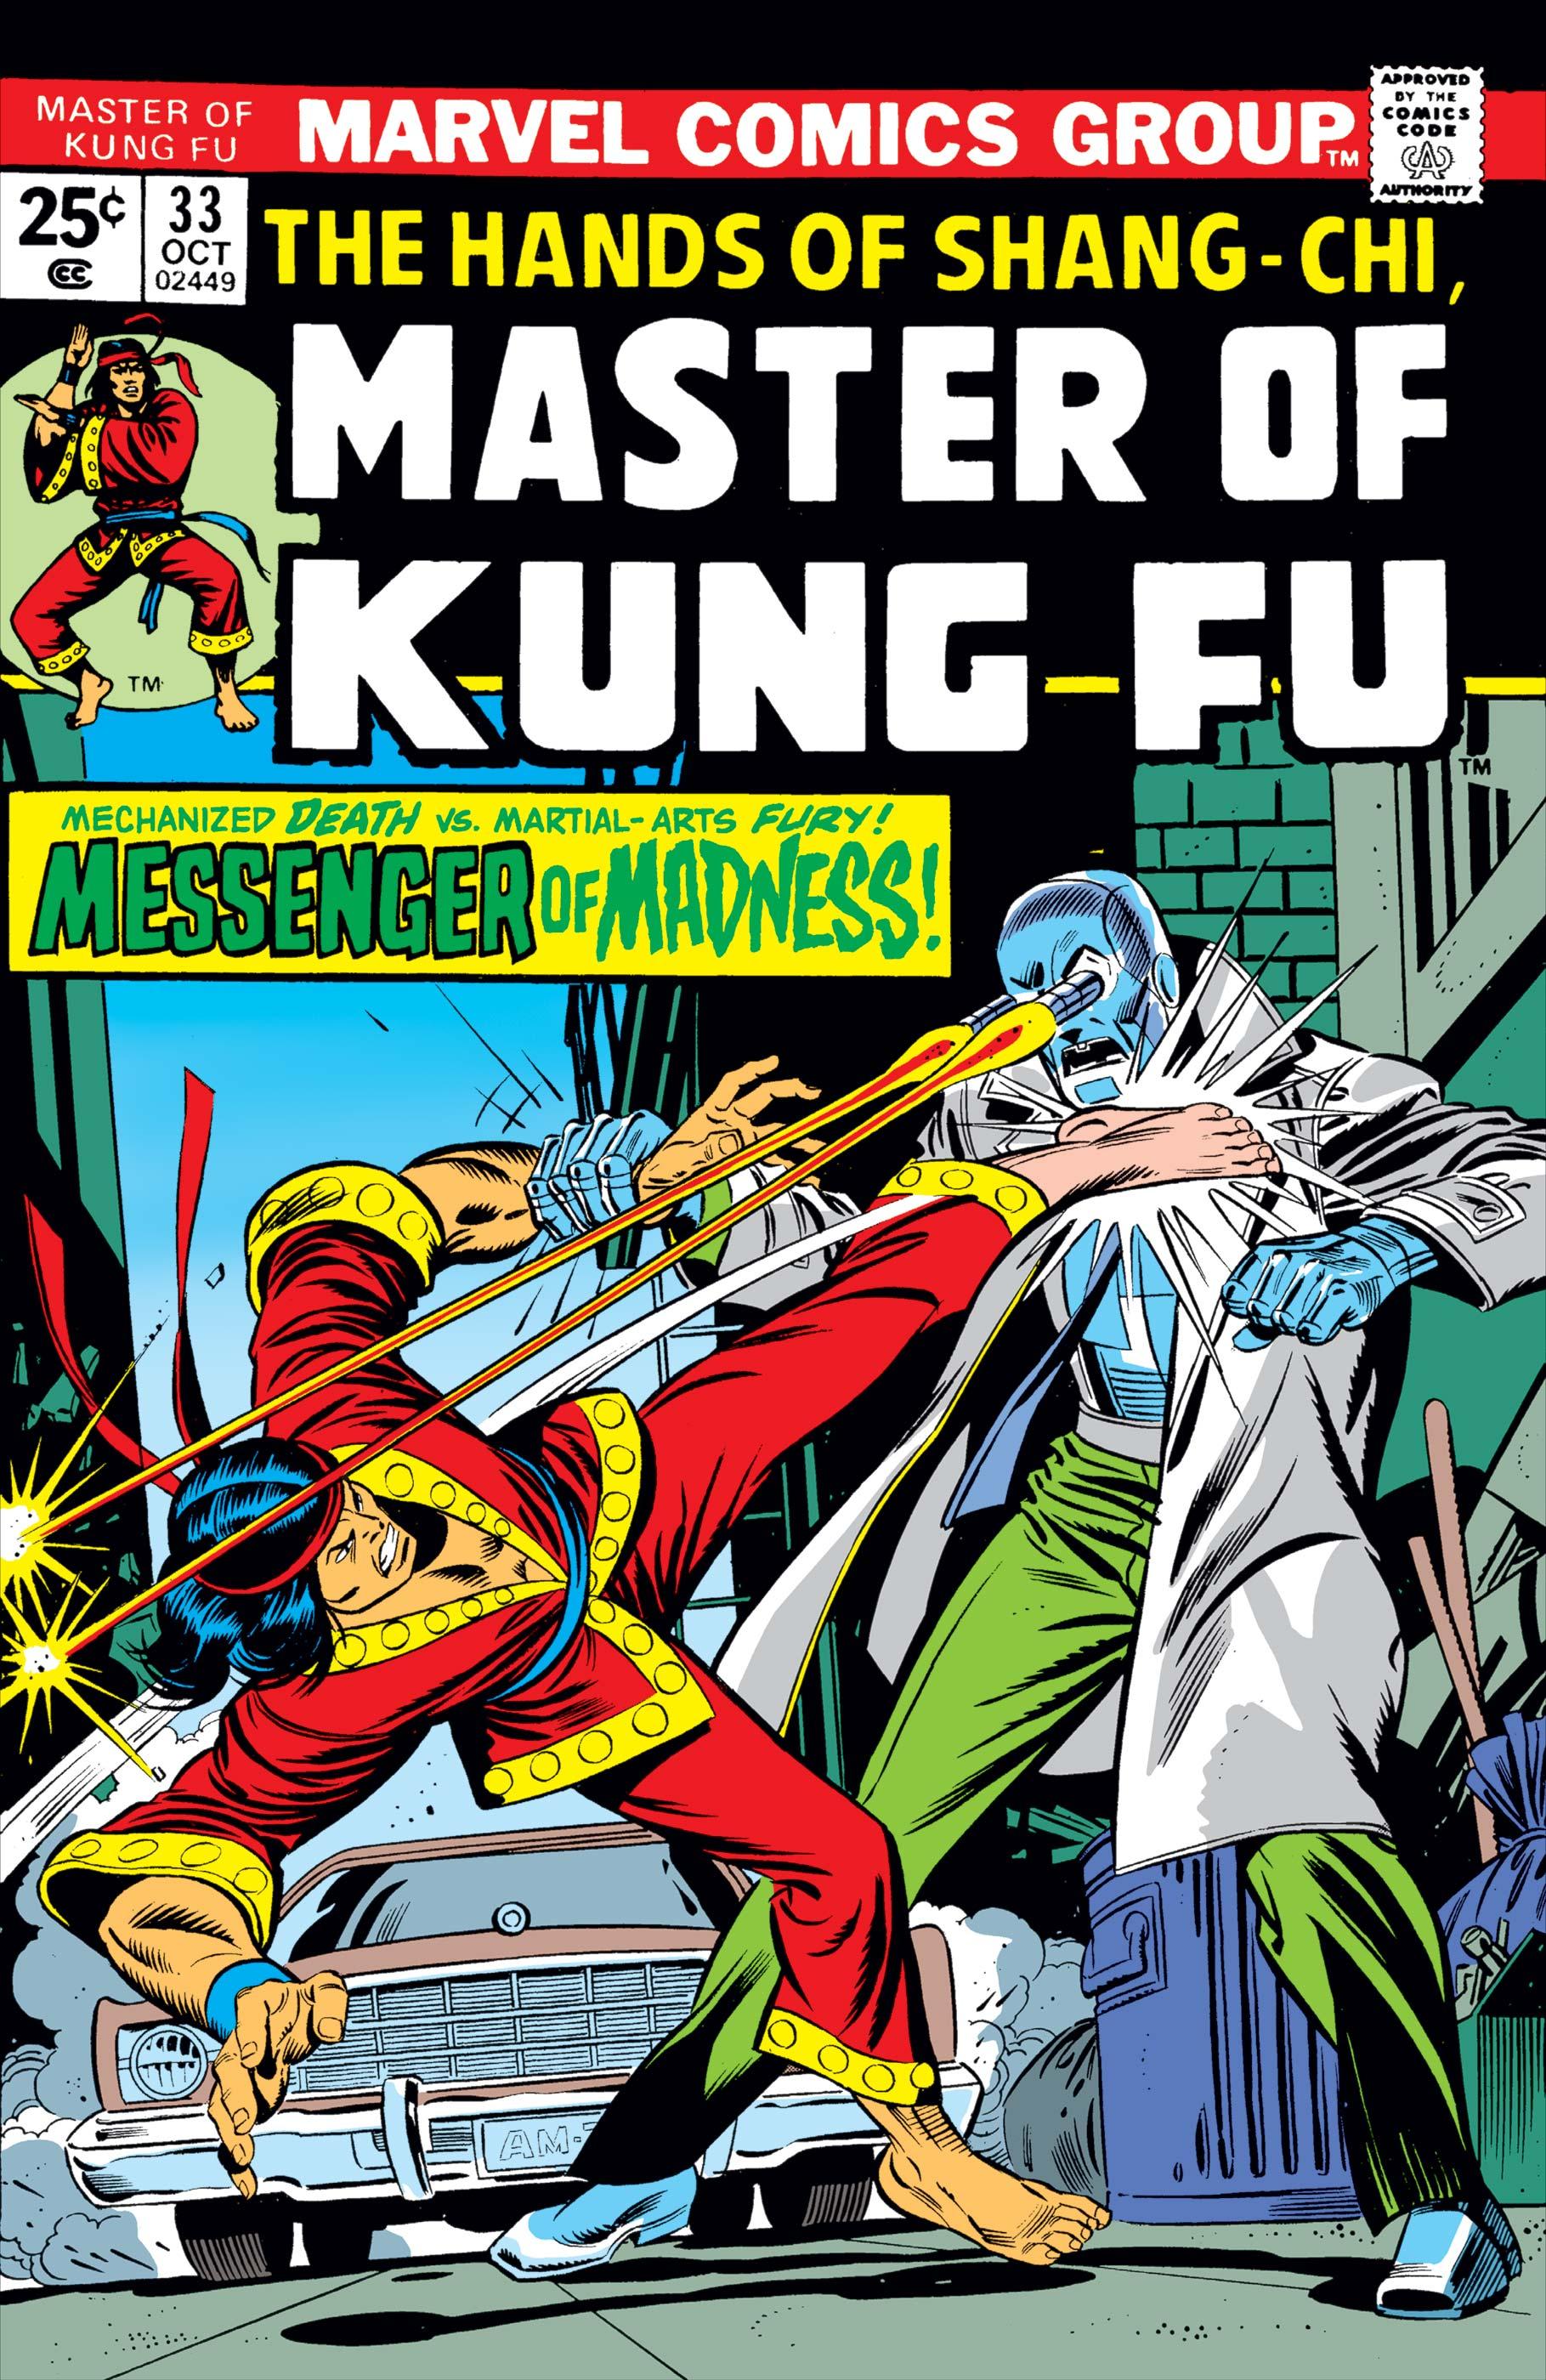 Master of Kung Fu (1974) #33